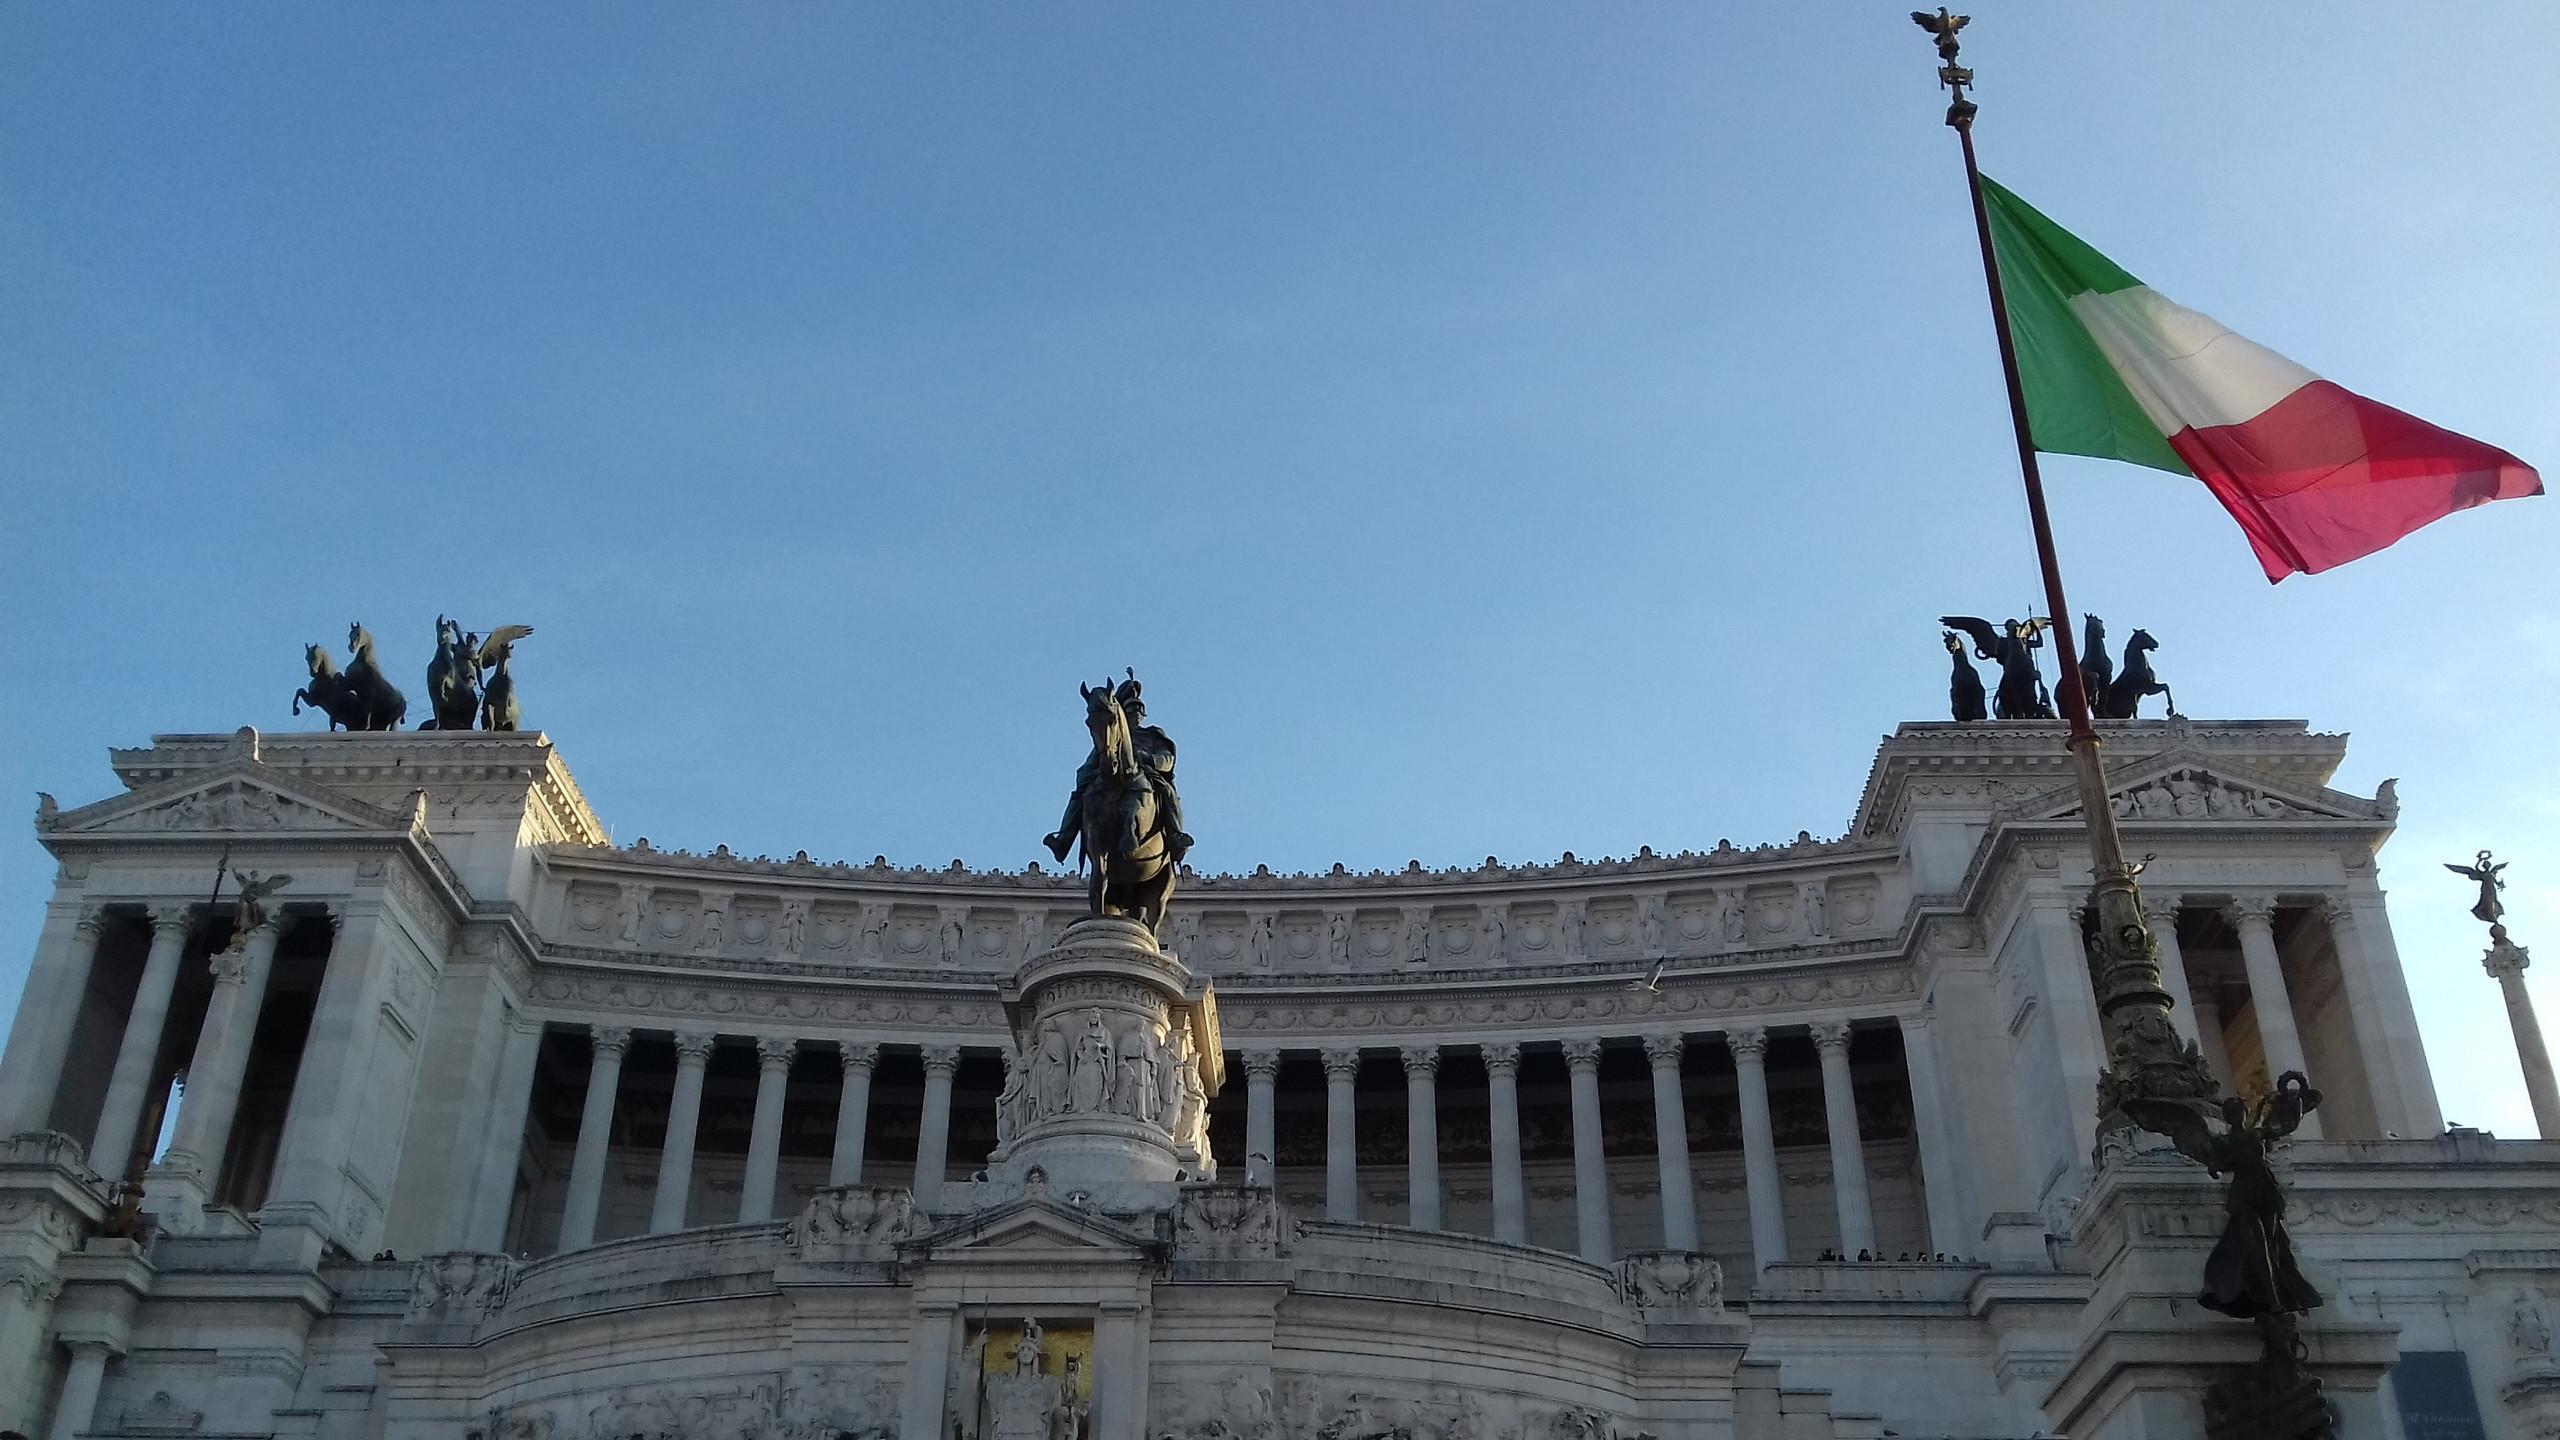 Séjour rome 2018 - 2019 (34)